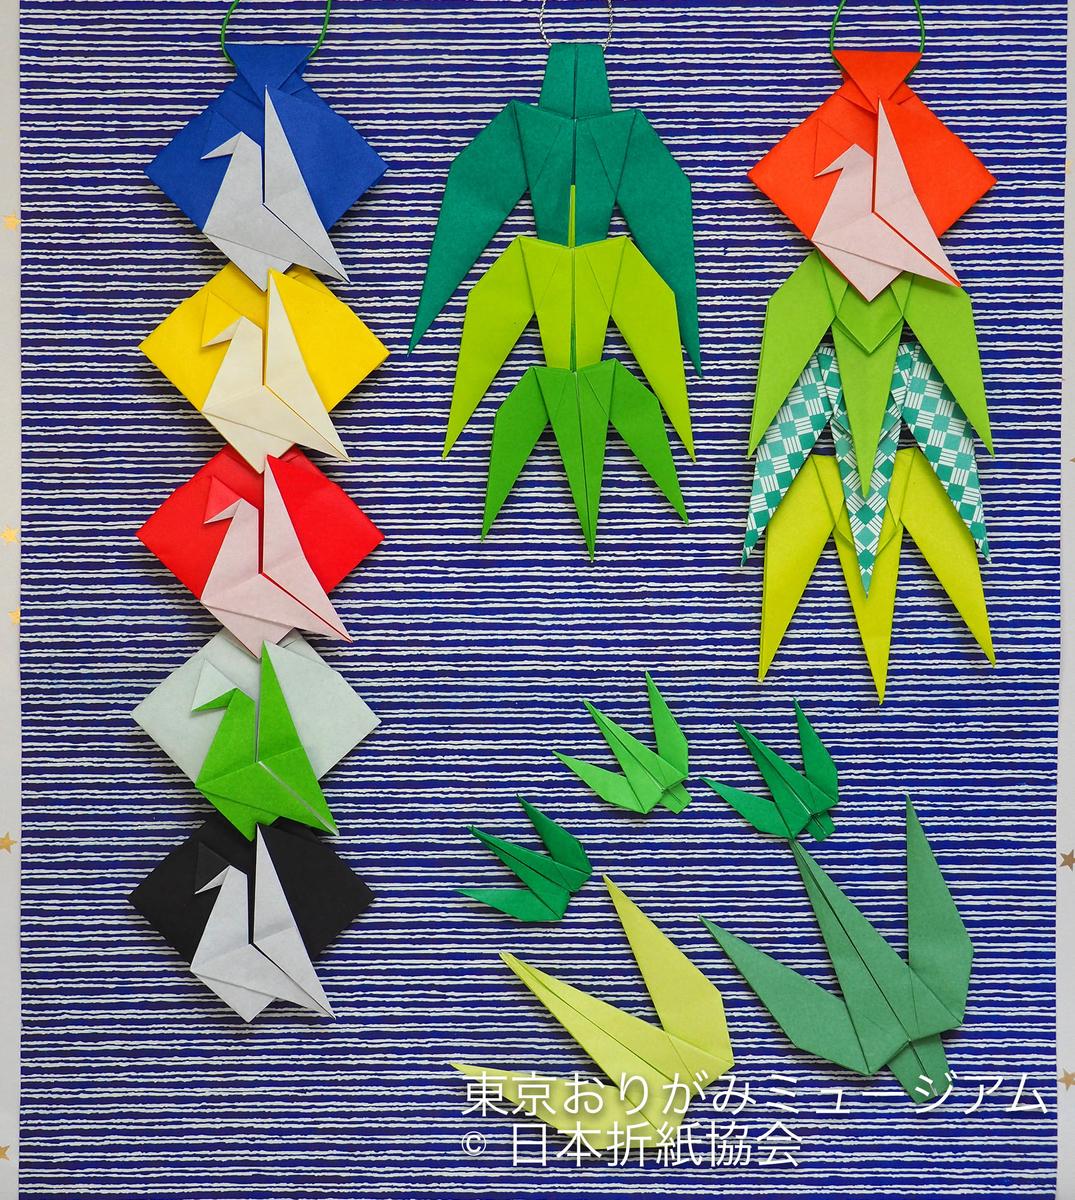 f:id:origami-noa:20190702150407j:plain